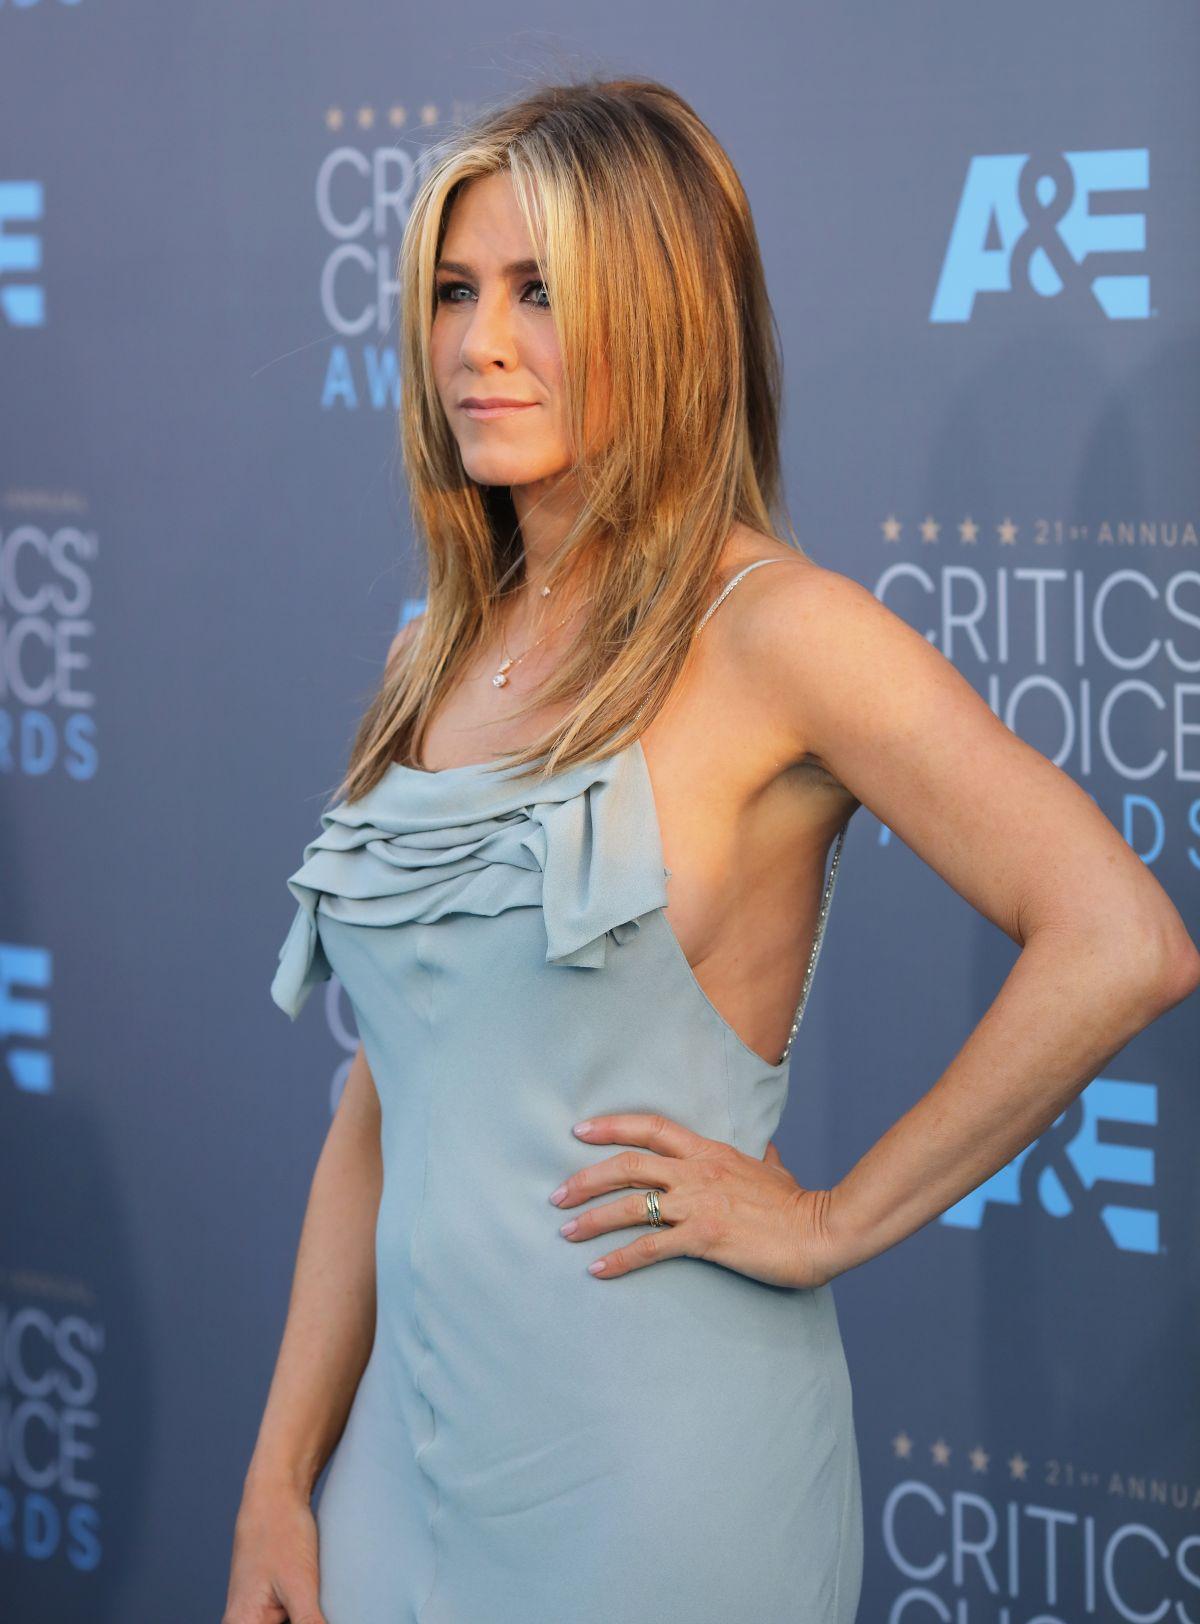 Actress Jennifer Aniston at the 2016 Critics Choice